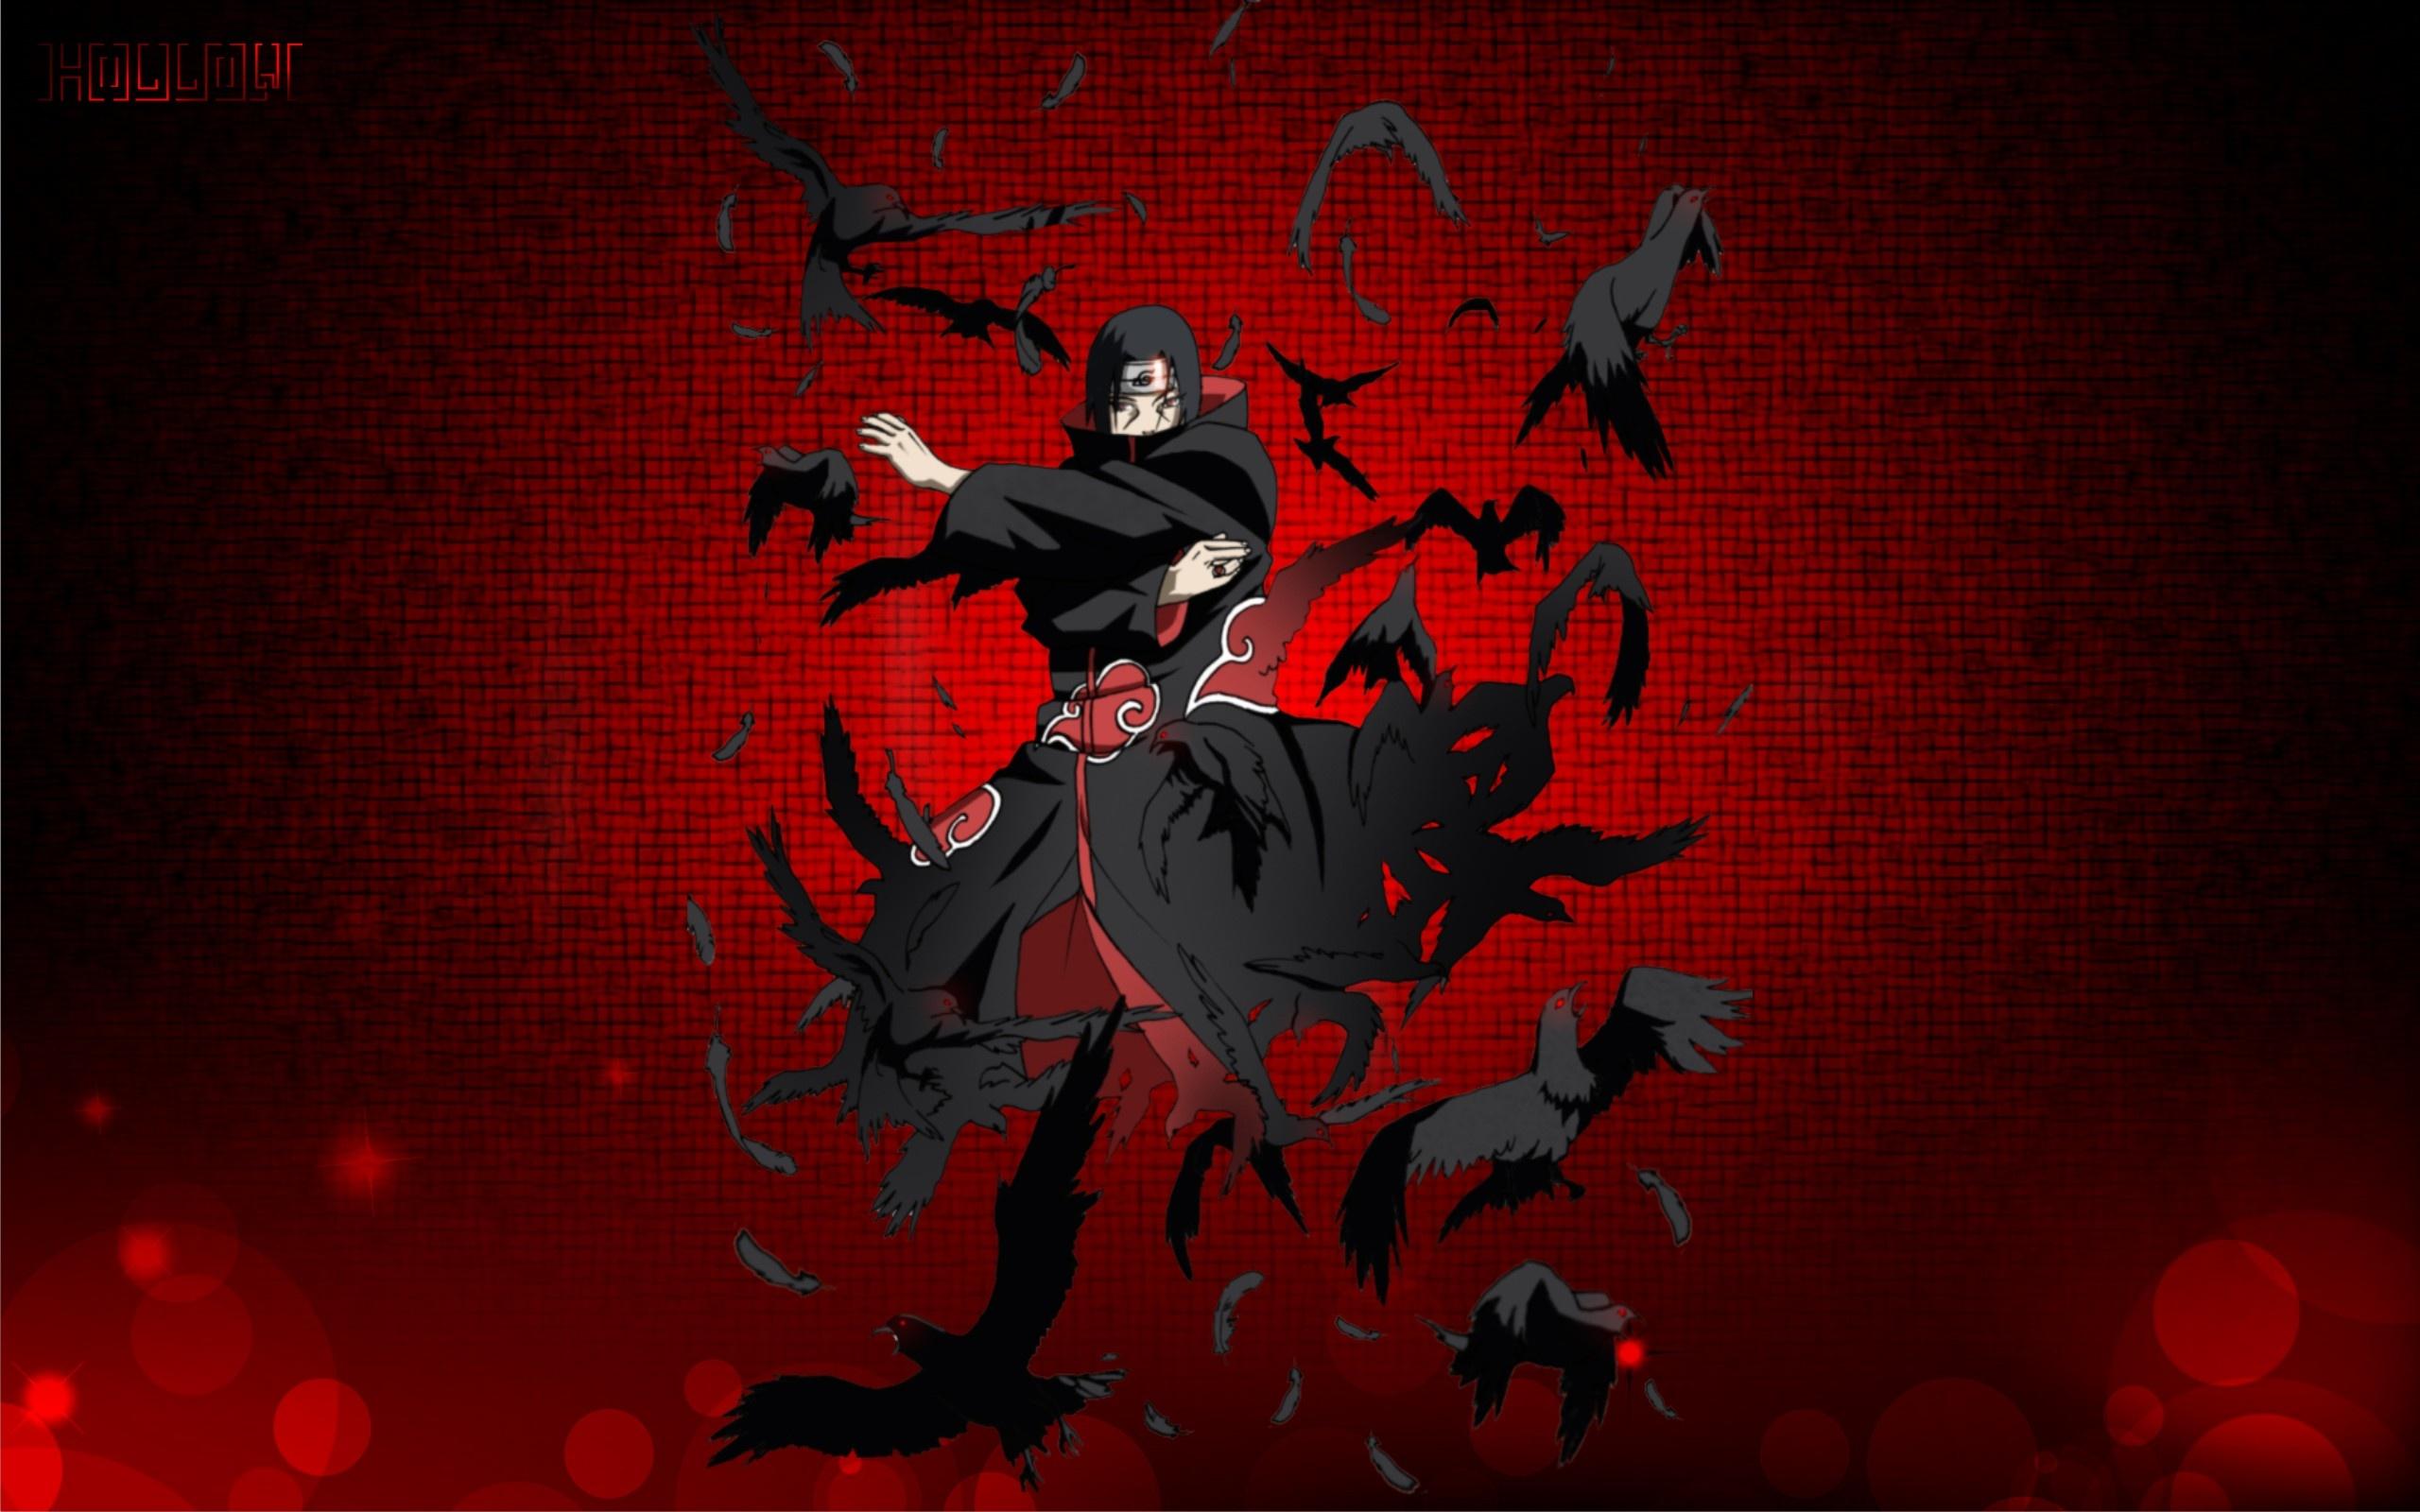 Naruto   Itachi Uchiha is a great wallpaper for your computer desktop 2560x1600